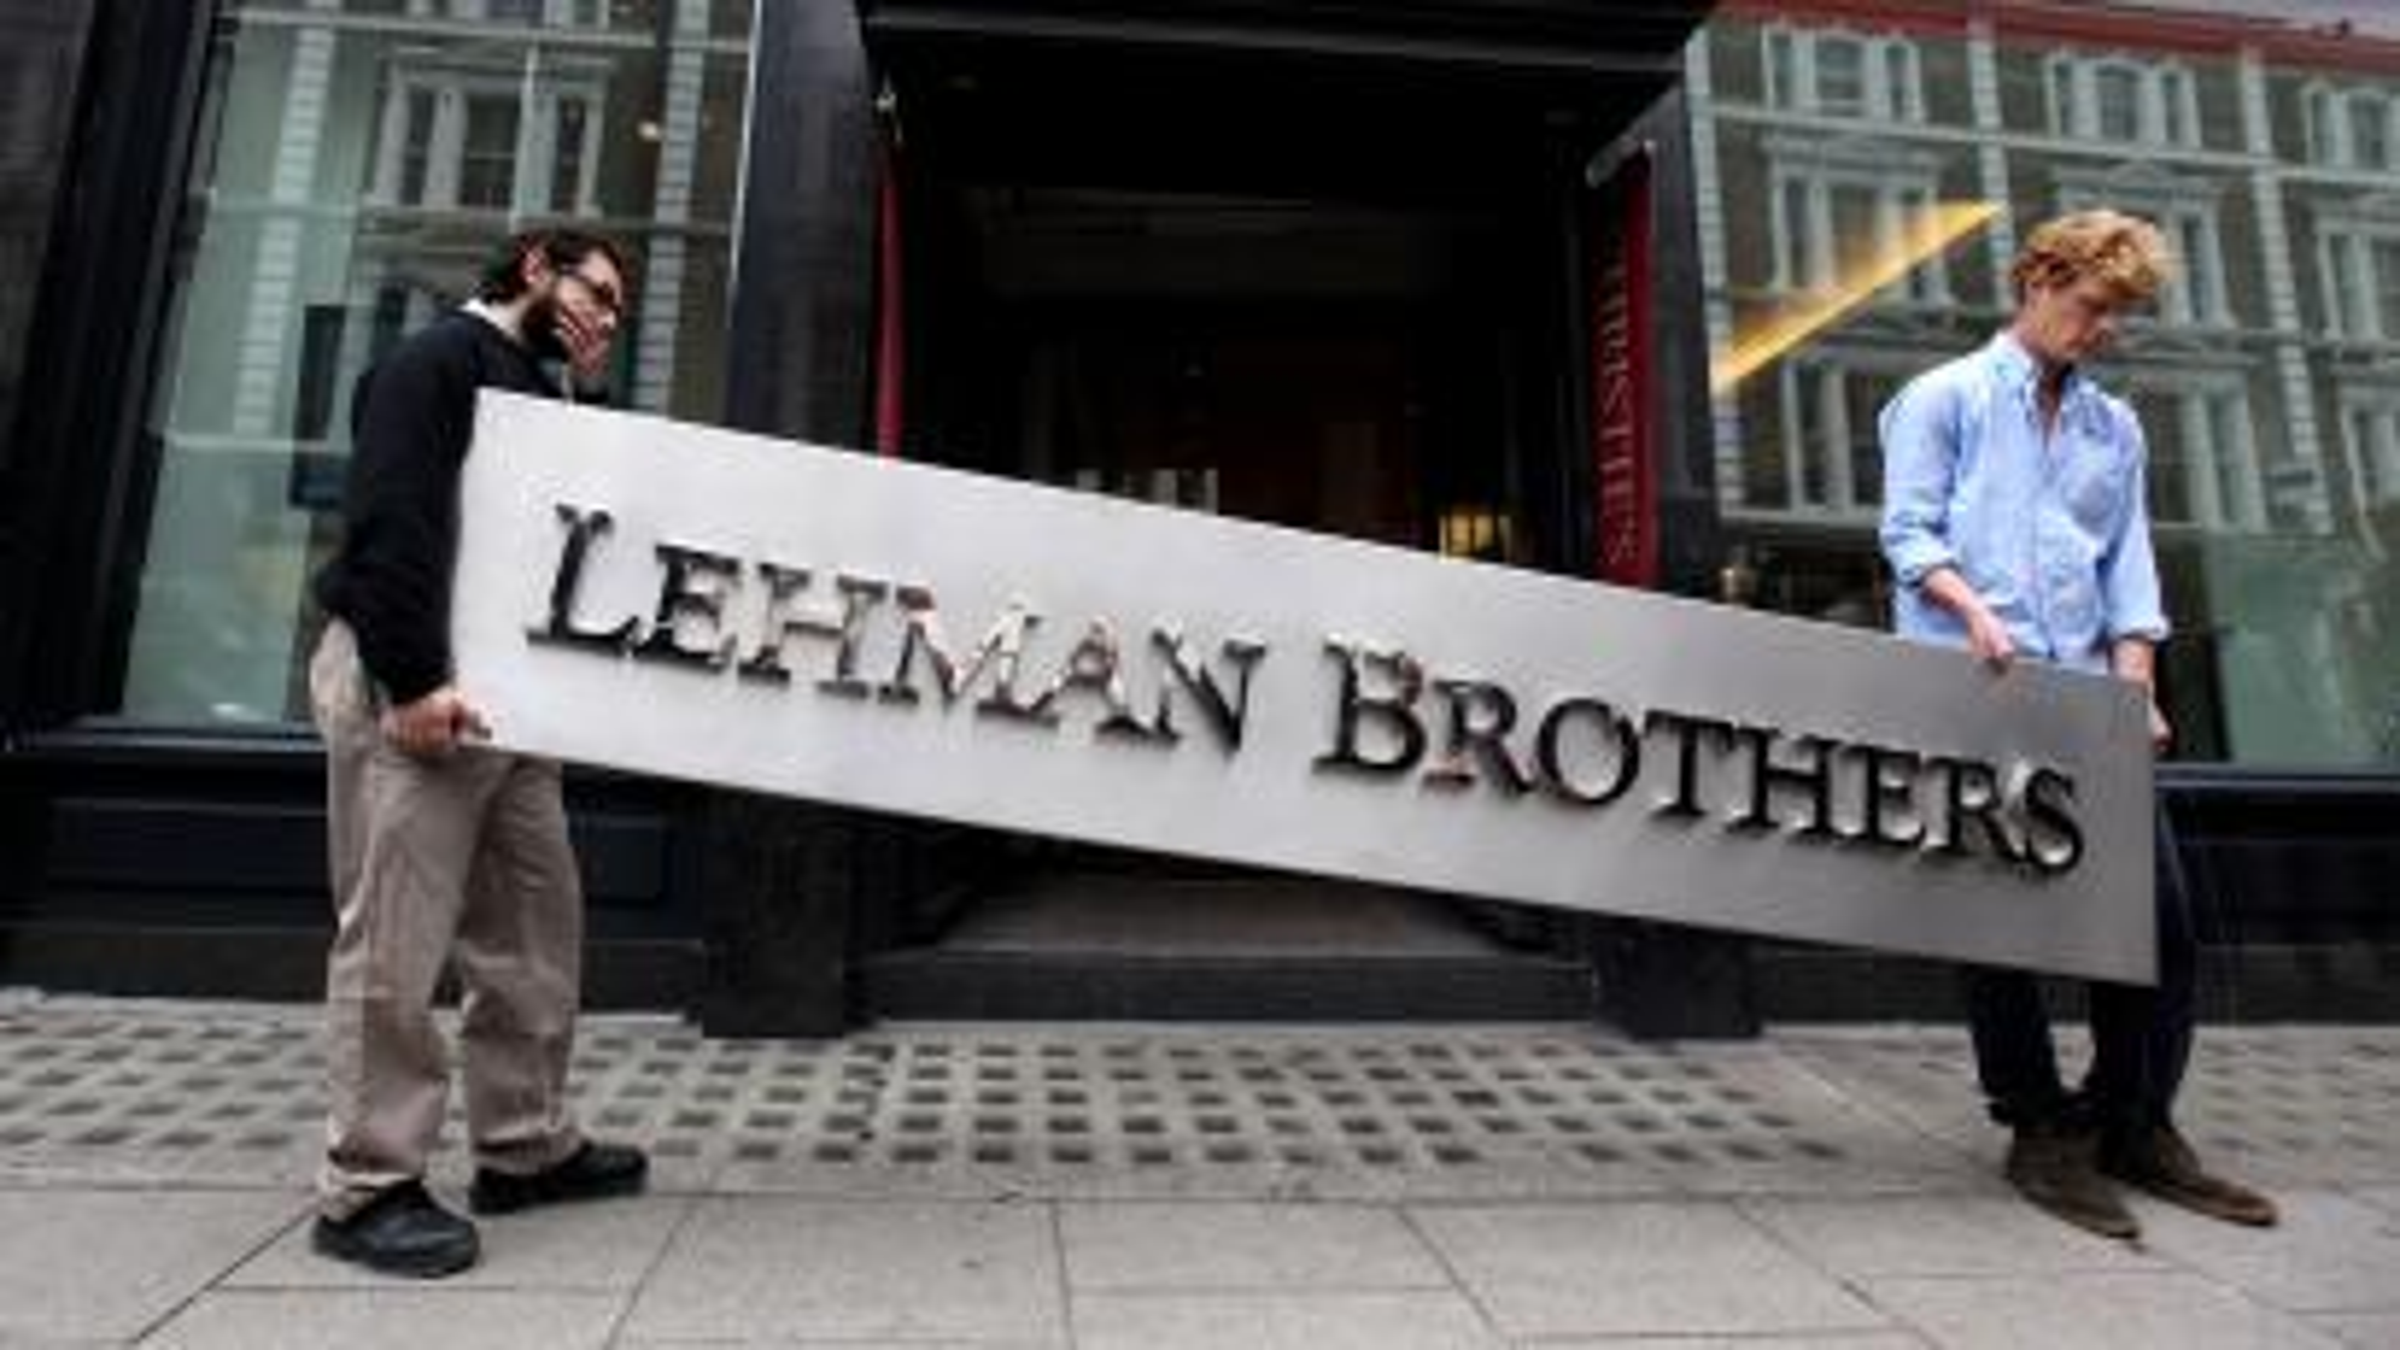 Lehman Brothers Christie's 10252012